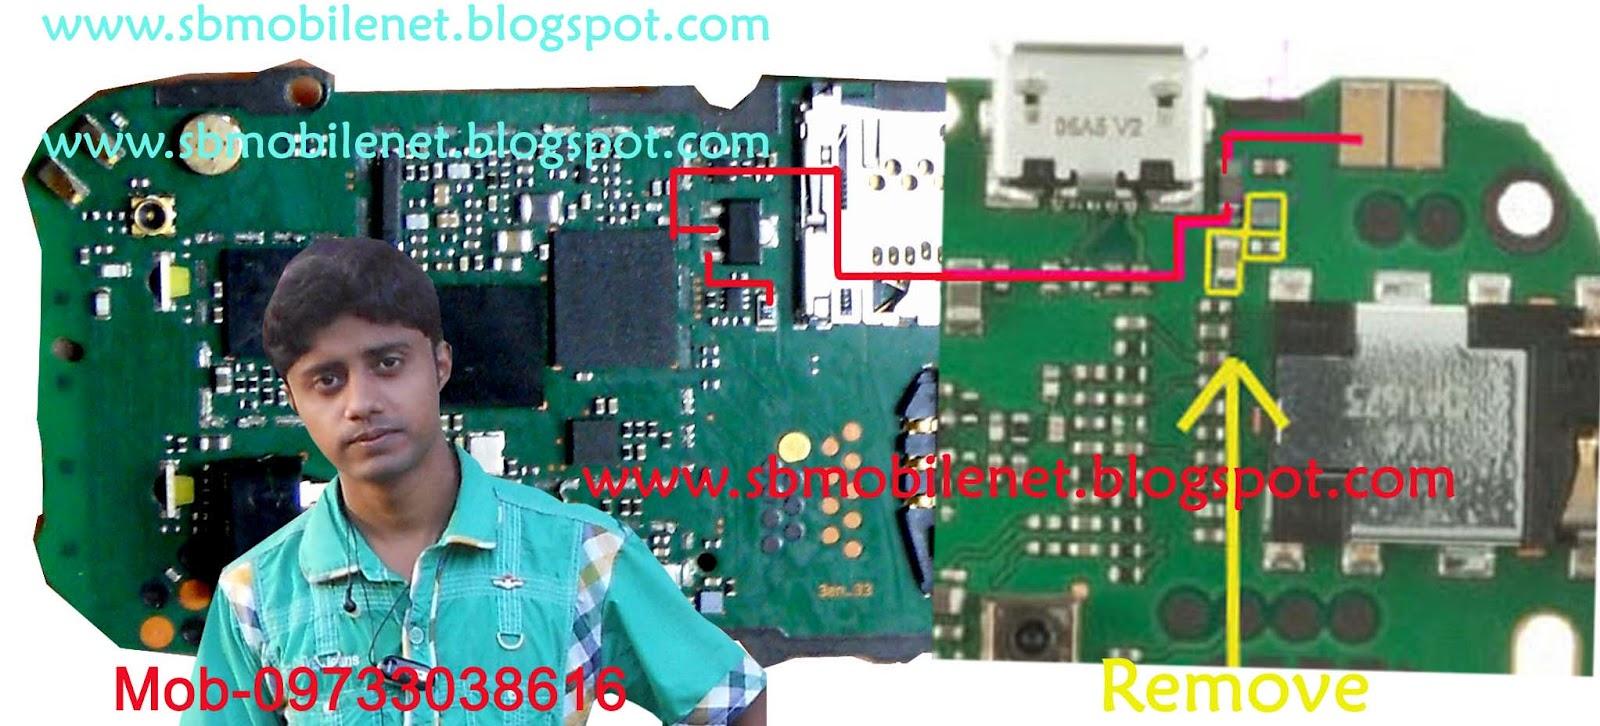 Nokia Solution Samgung Chaina Mobile Hardware Solution